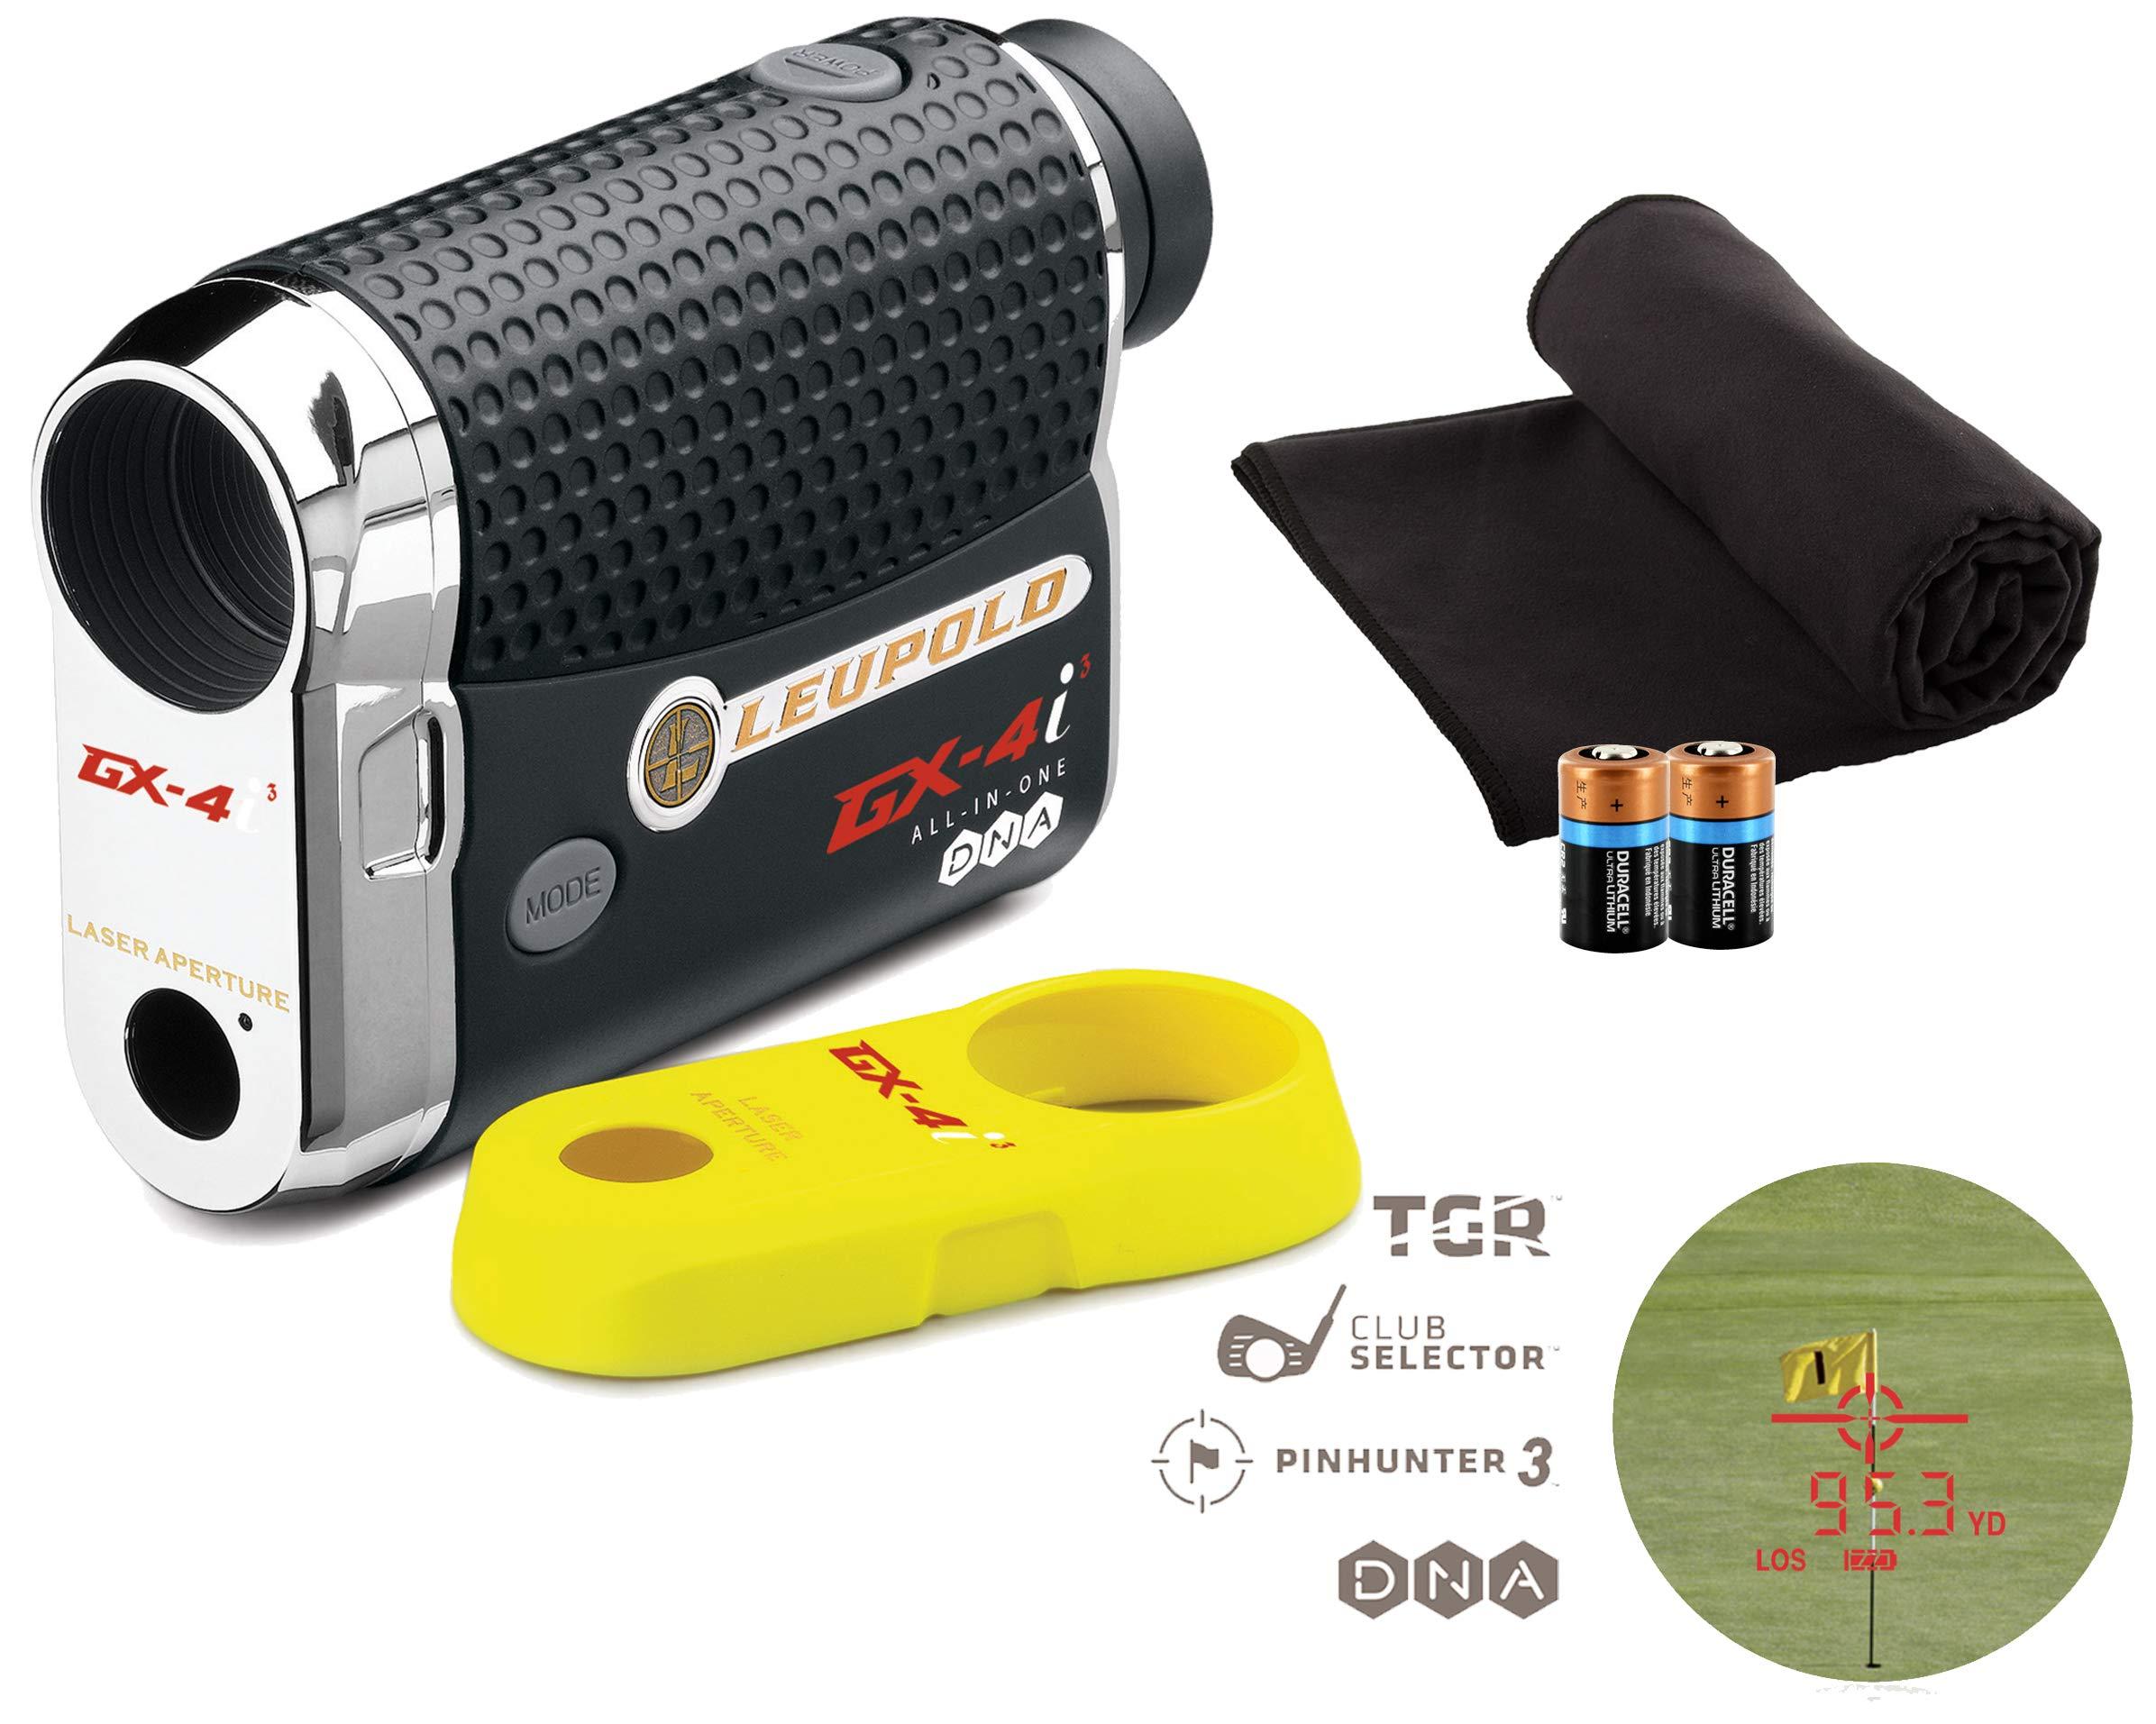 Rangefinder Non Slope PlayBetter Microfiber Batteries